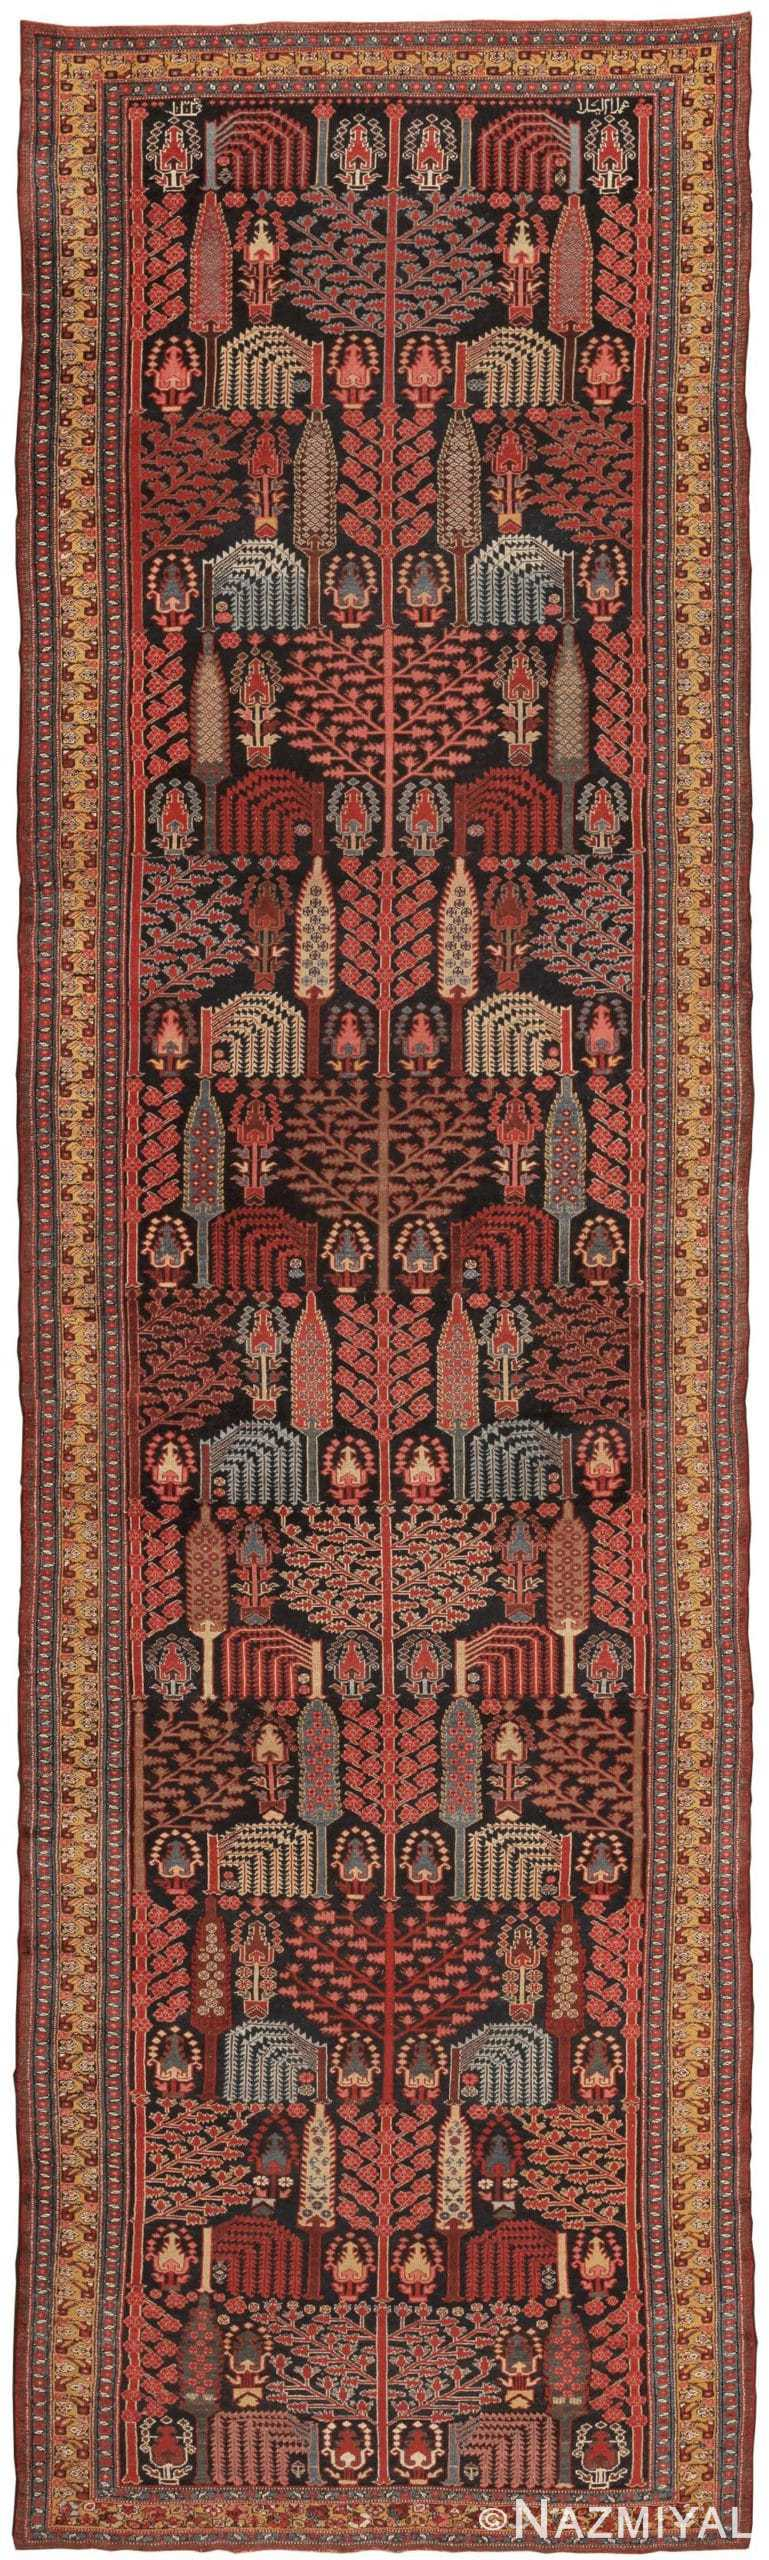 Antique Bakhtiari Persian Rug 44990 Nazmiyal